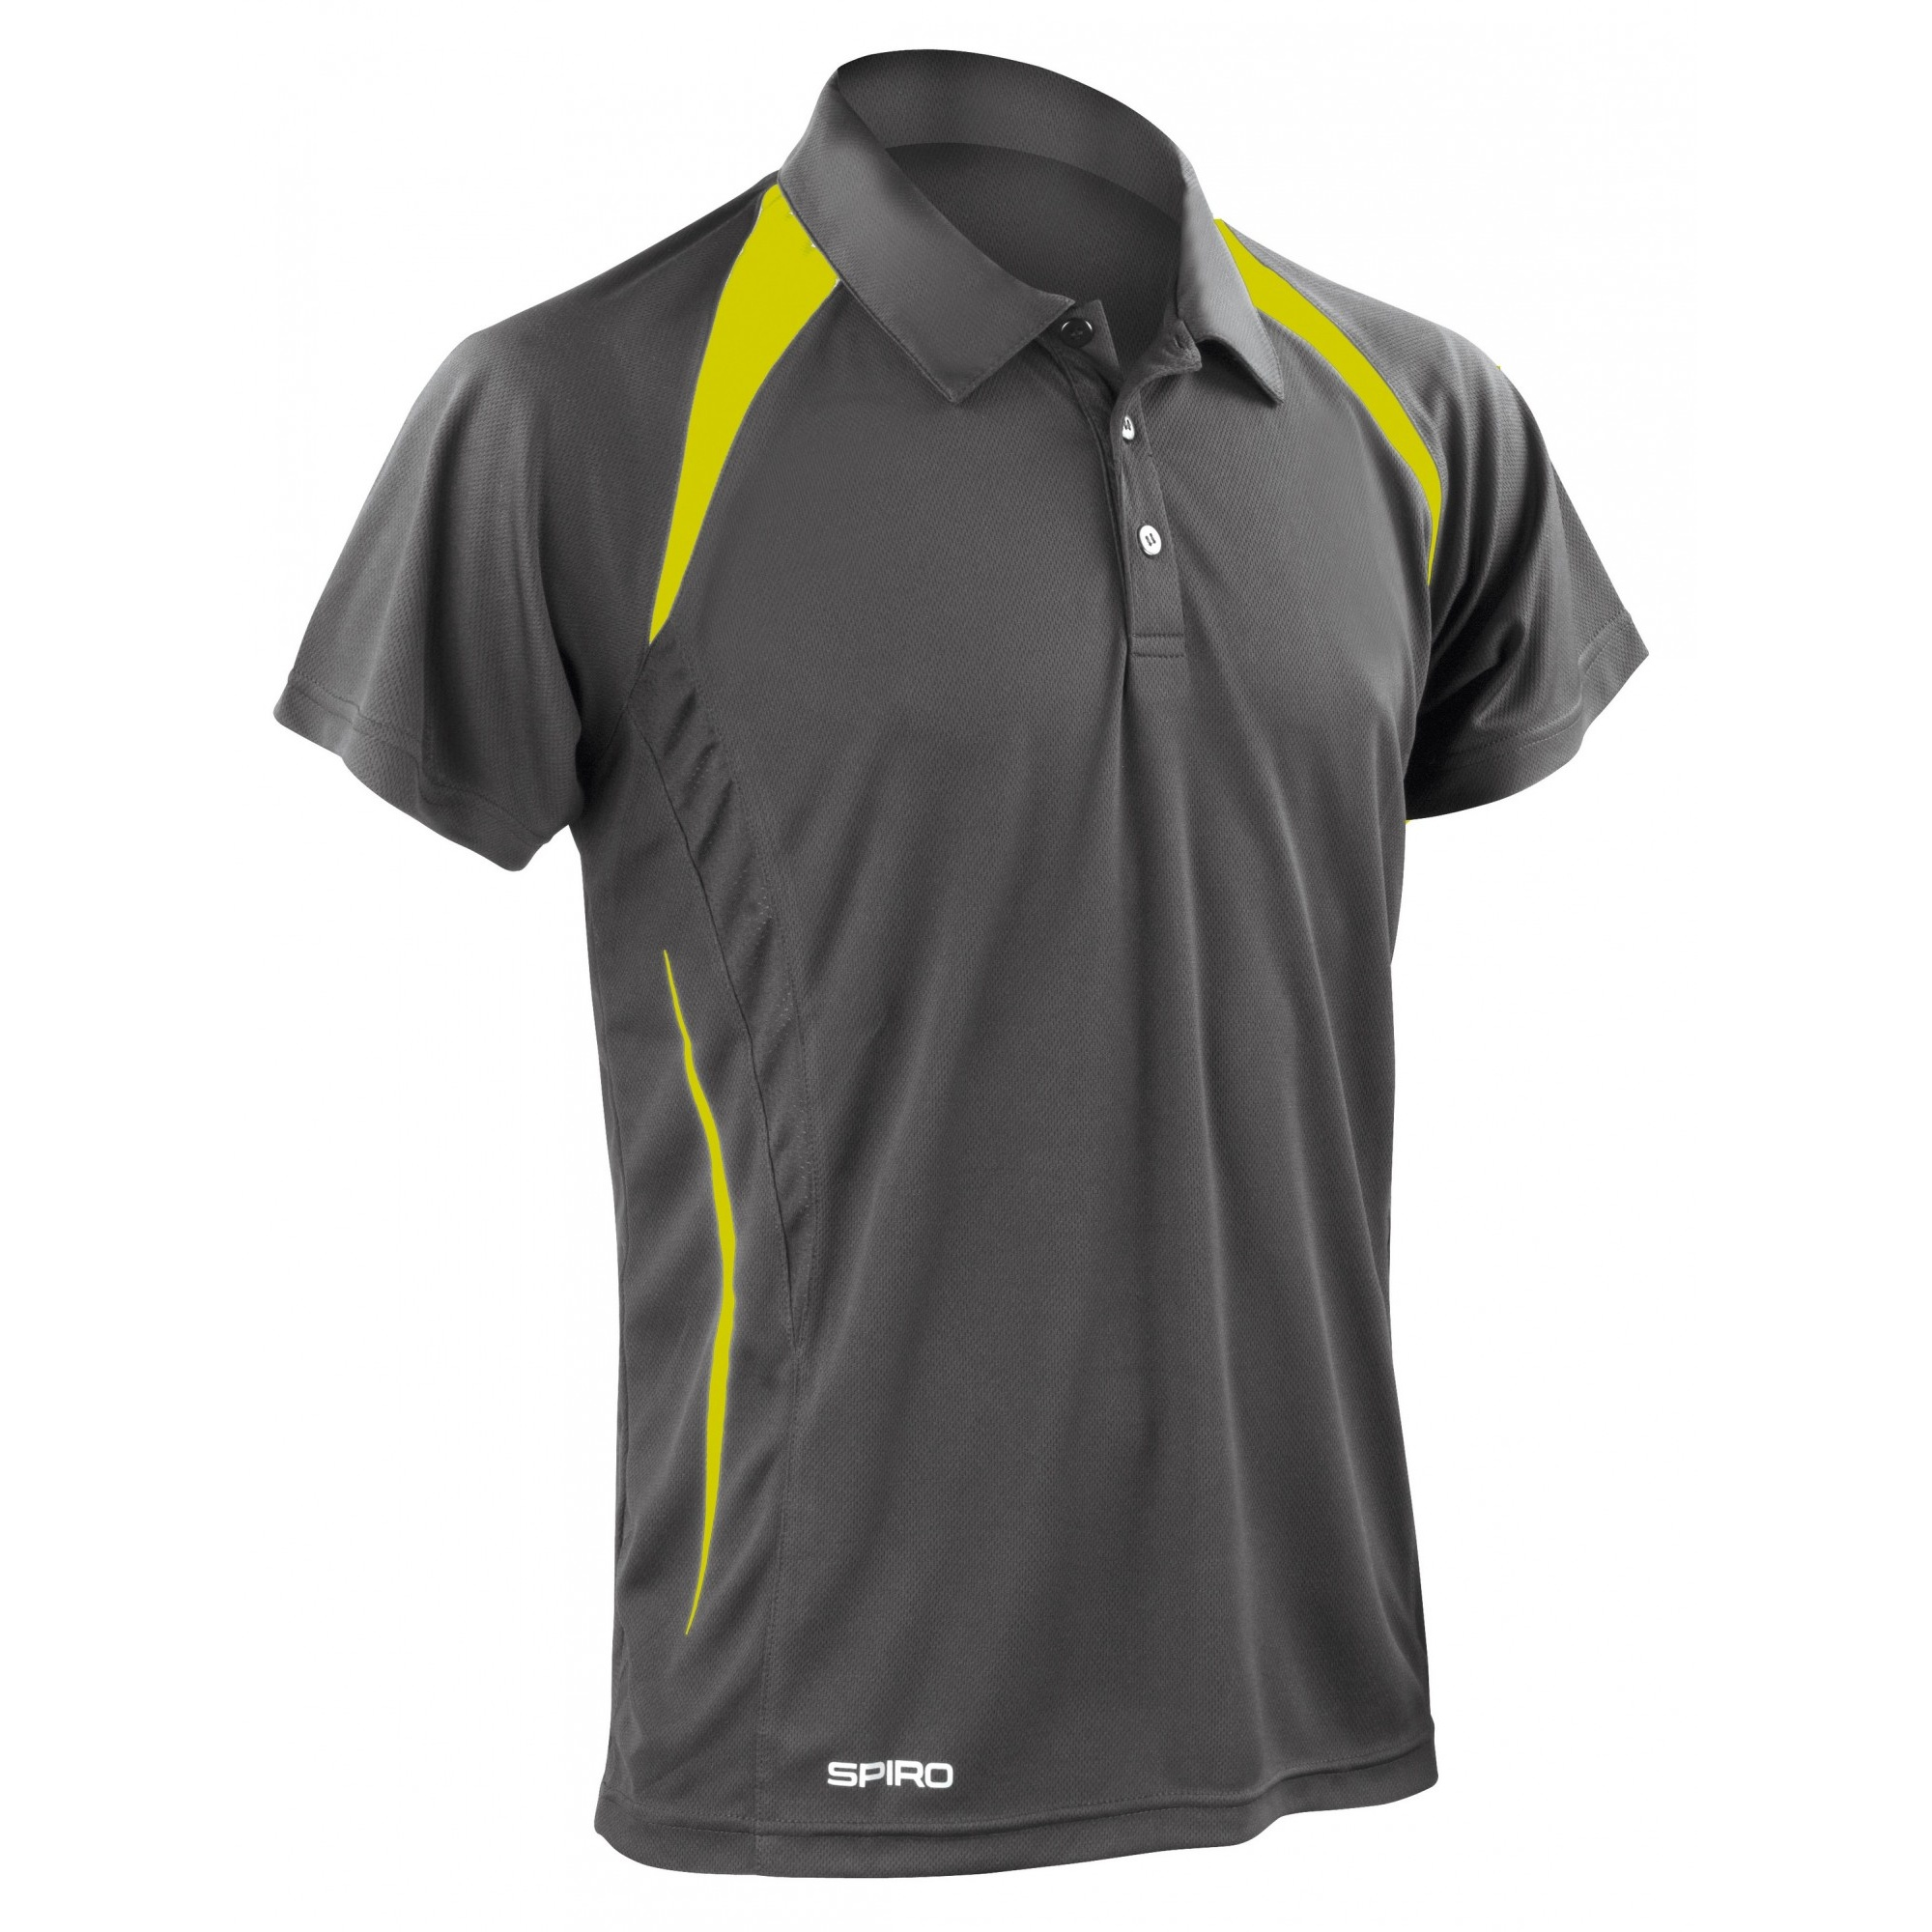 spiro mens sports team spirit performance short sleeve